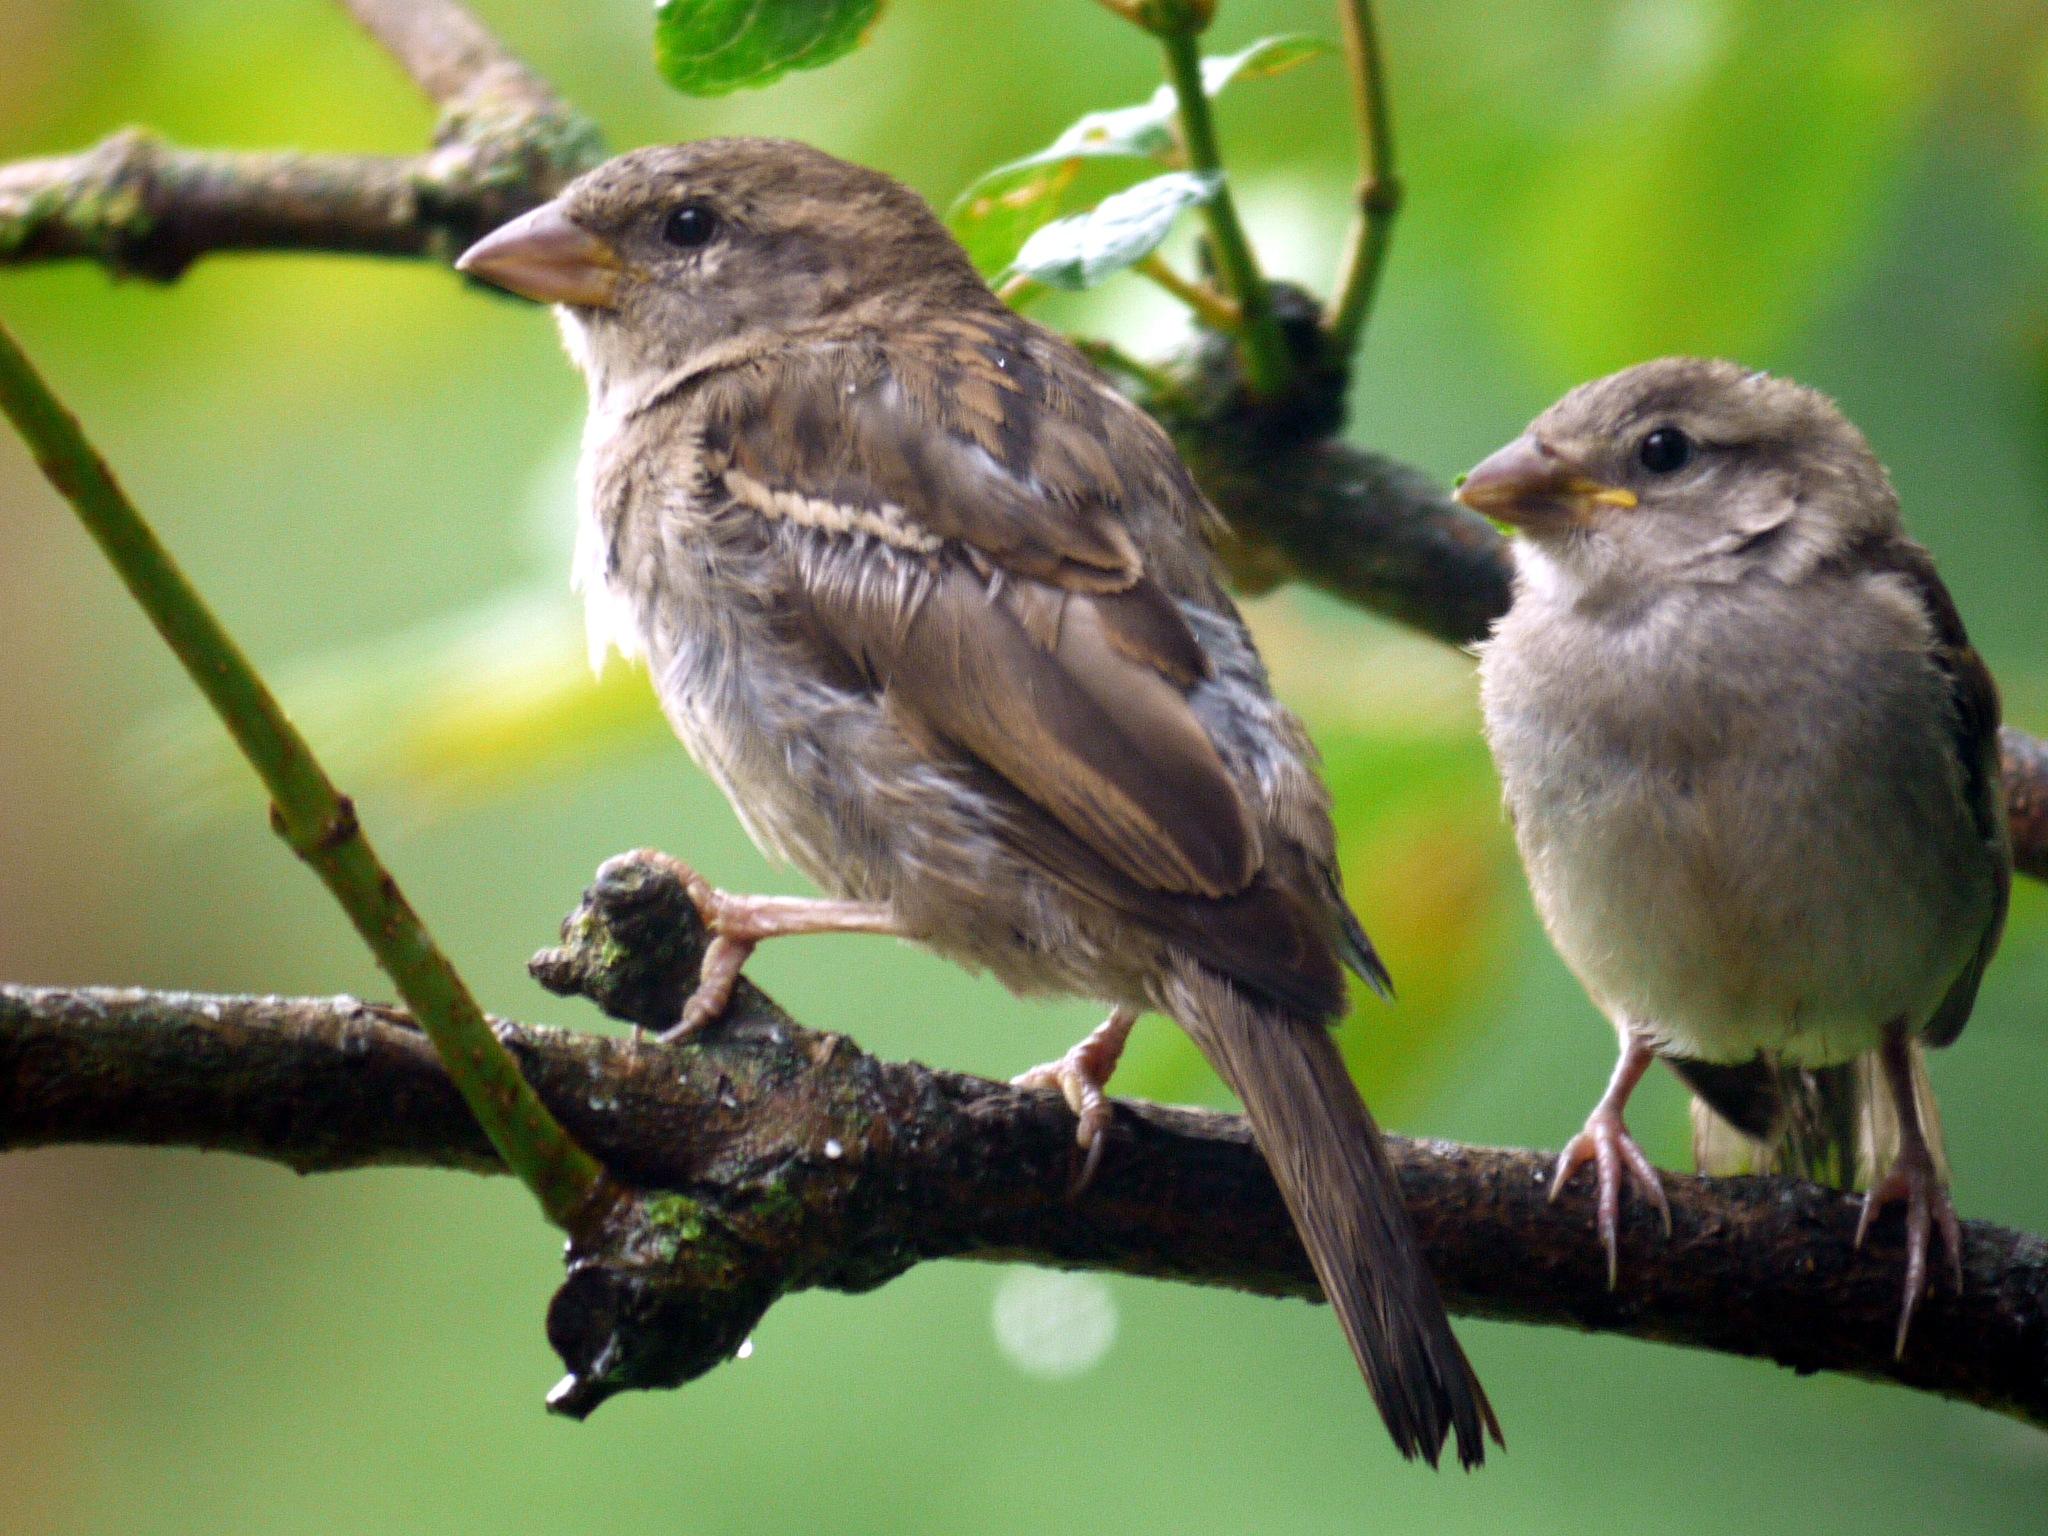 House sparrows by Derek Hollis